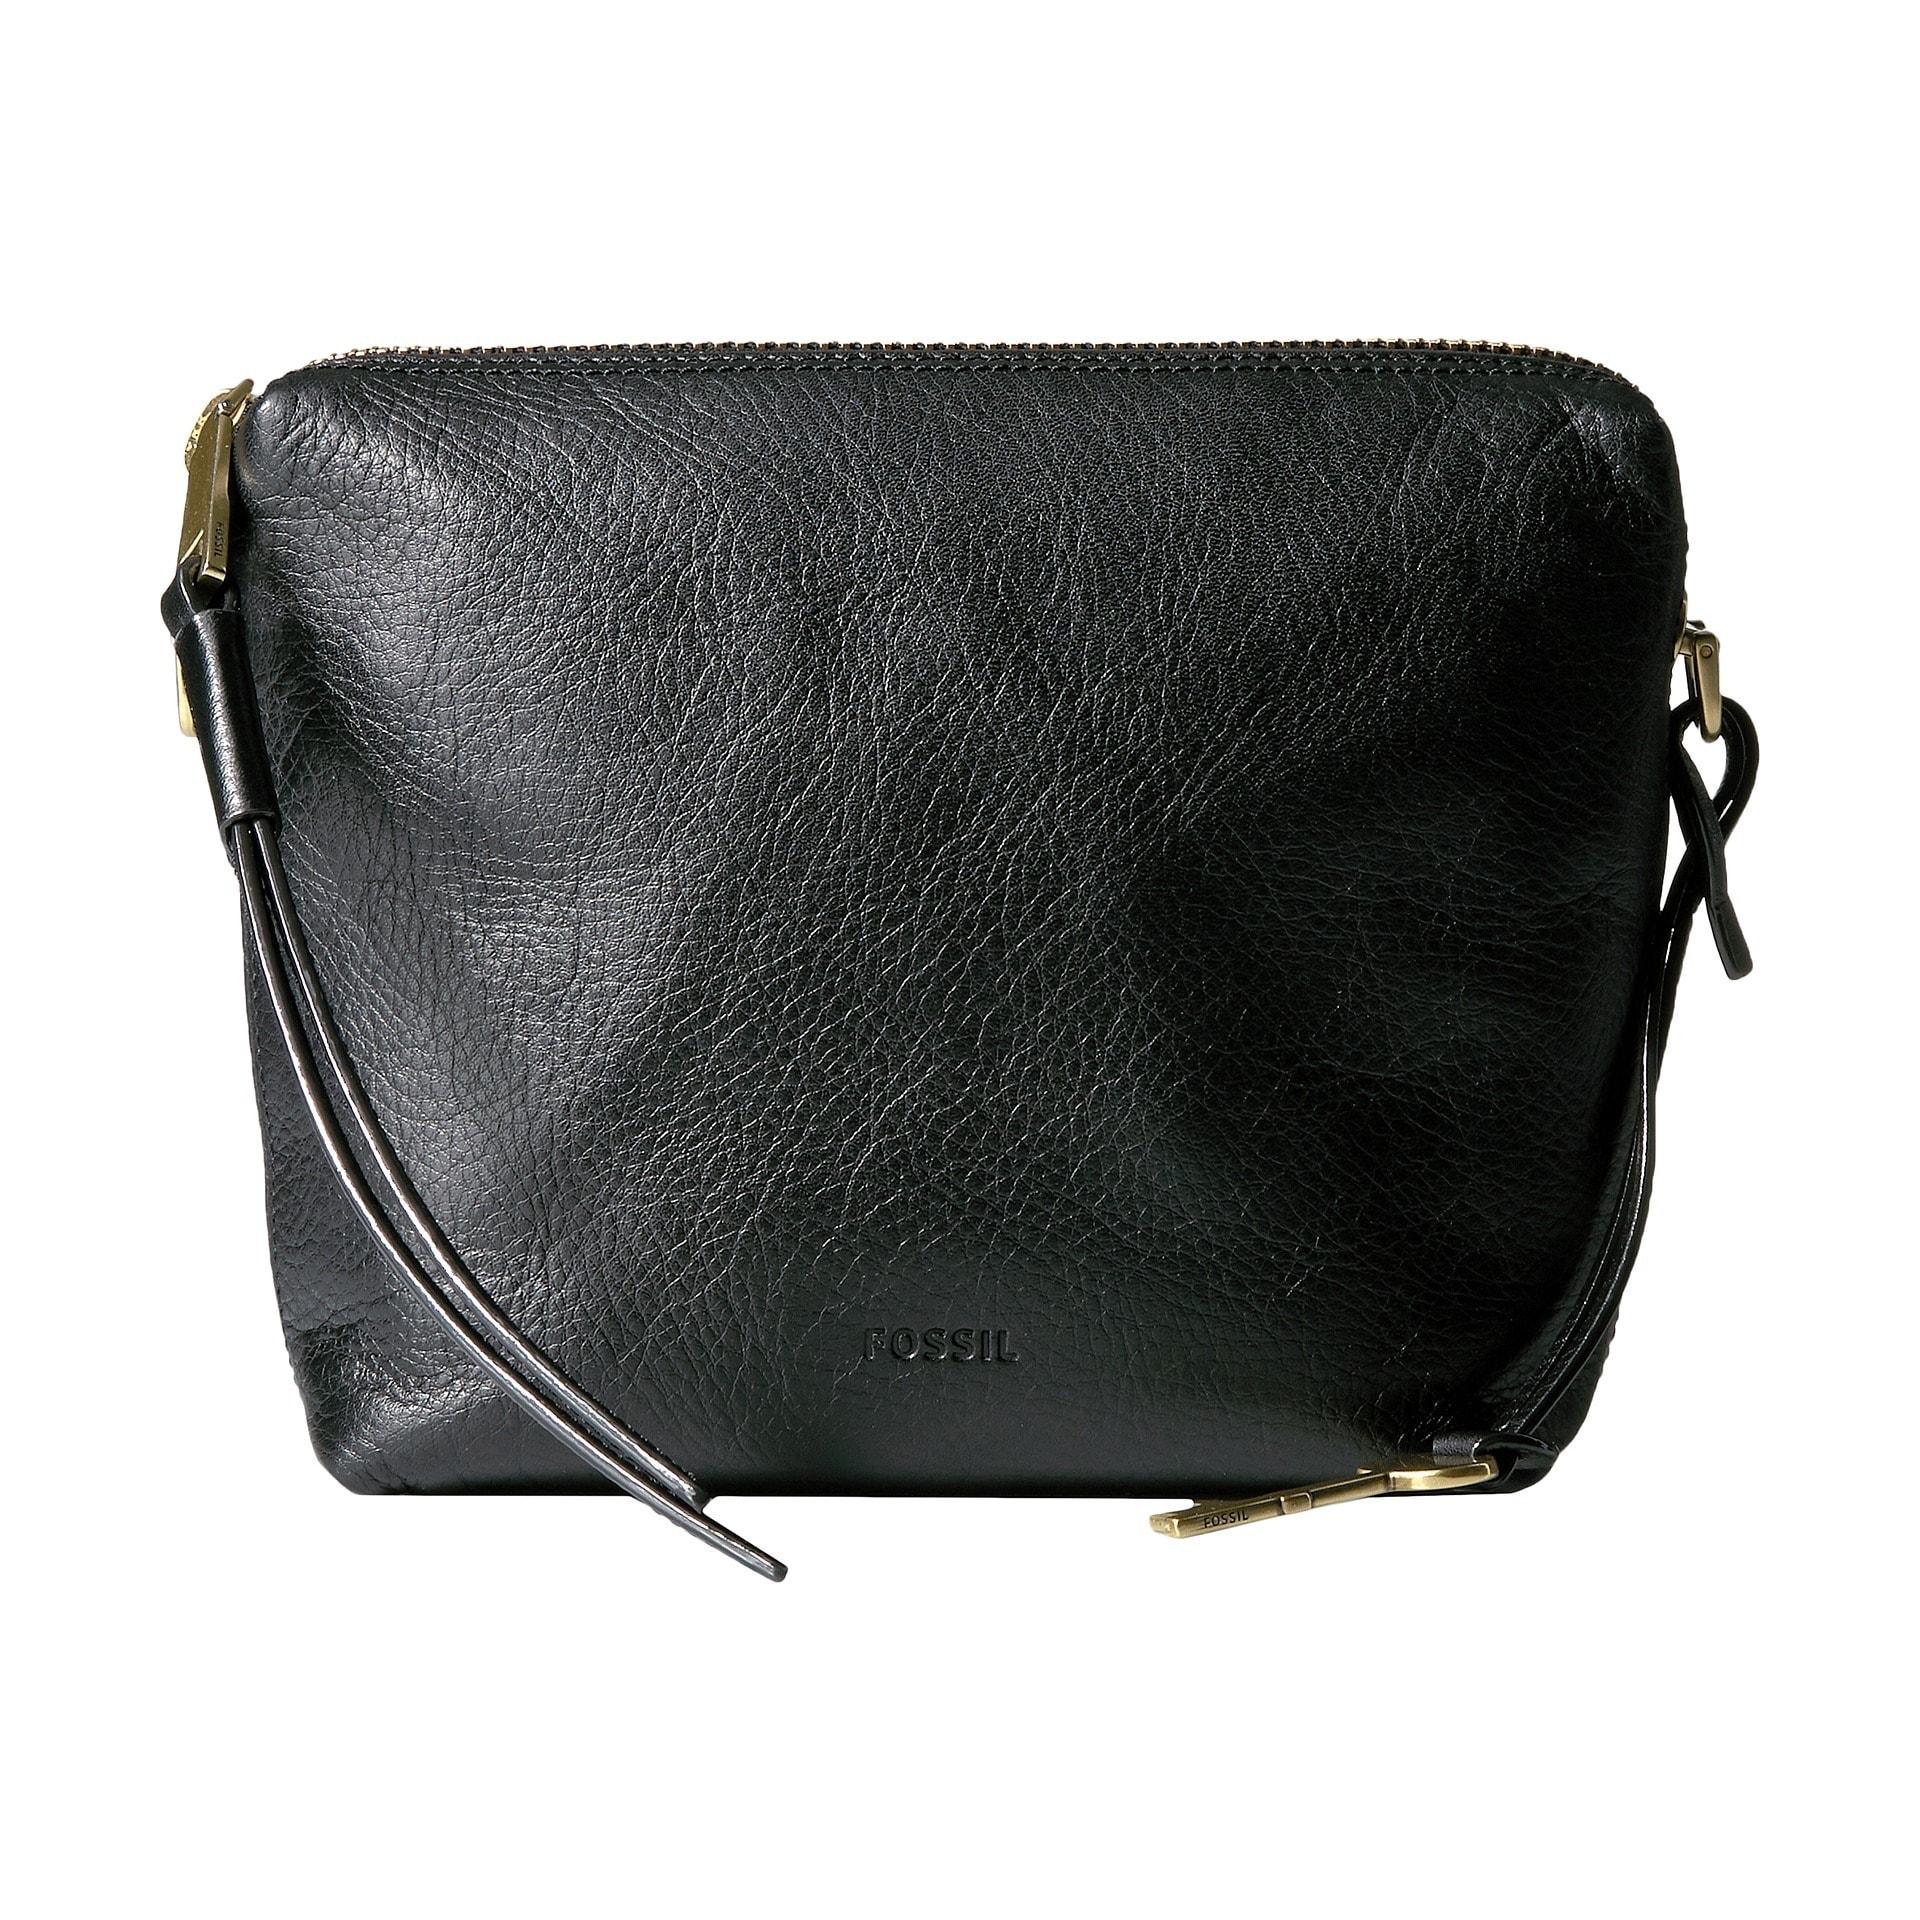 Fossil Maya Black Leather Crossbody Handbag (Black), Women's